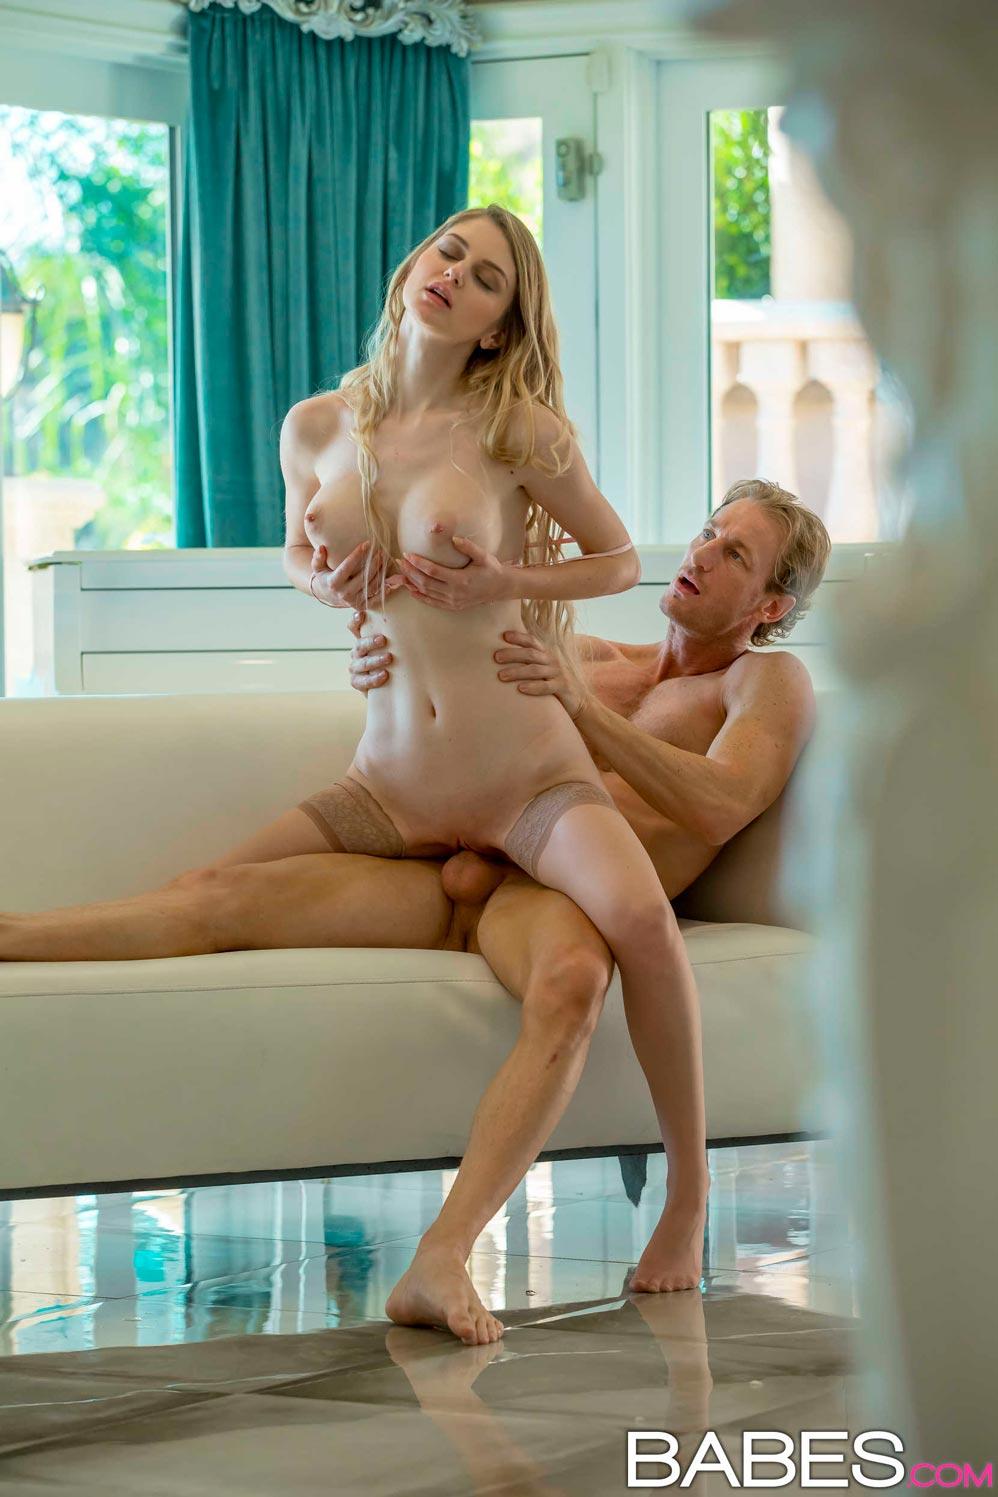 Anal sex photos position